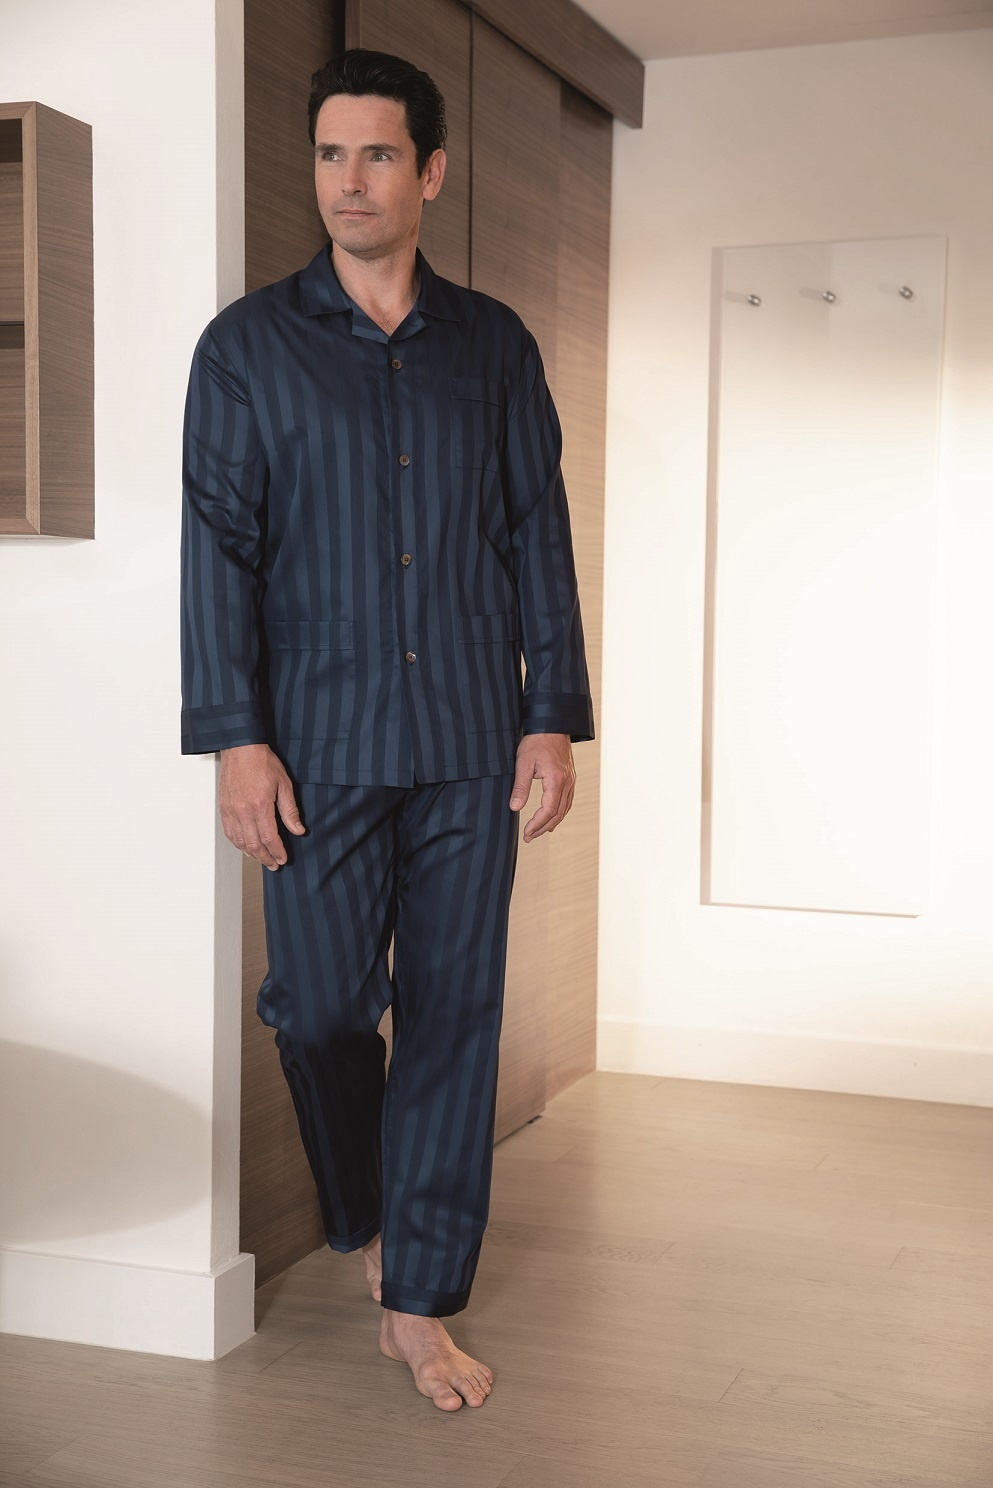 best service 90ddd 51f2b Luxus Herren Pyjama-Novila- Textile Träume